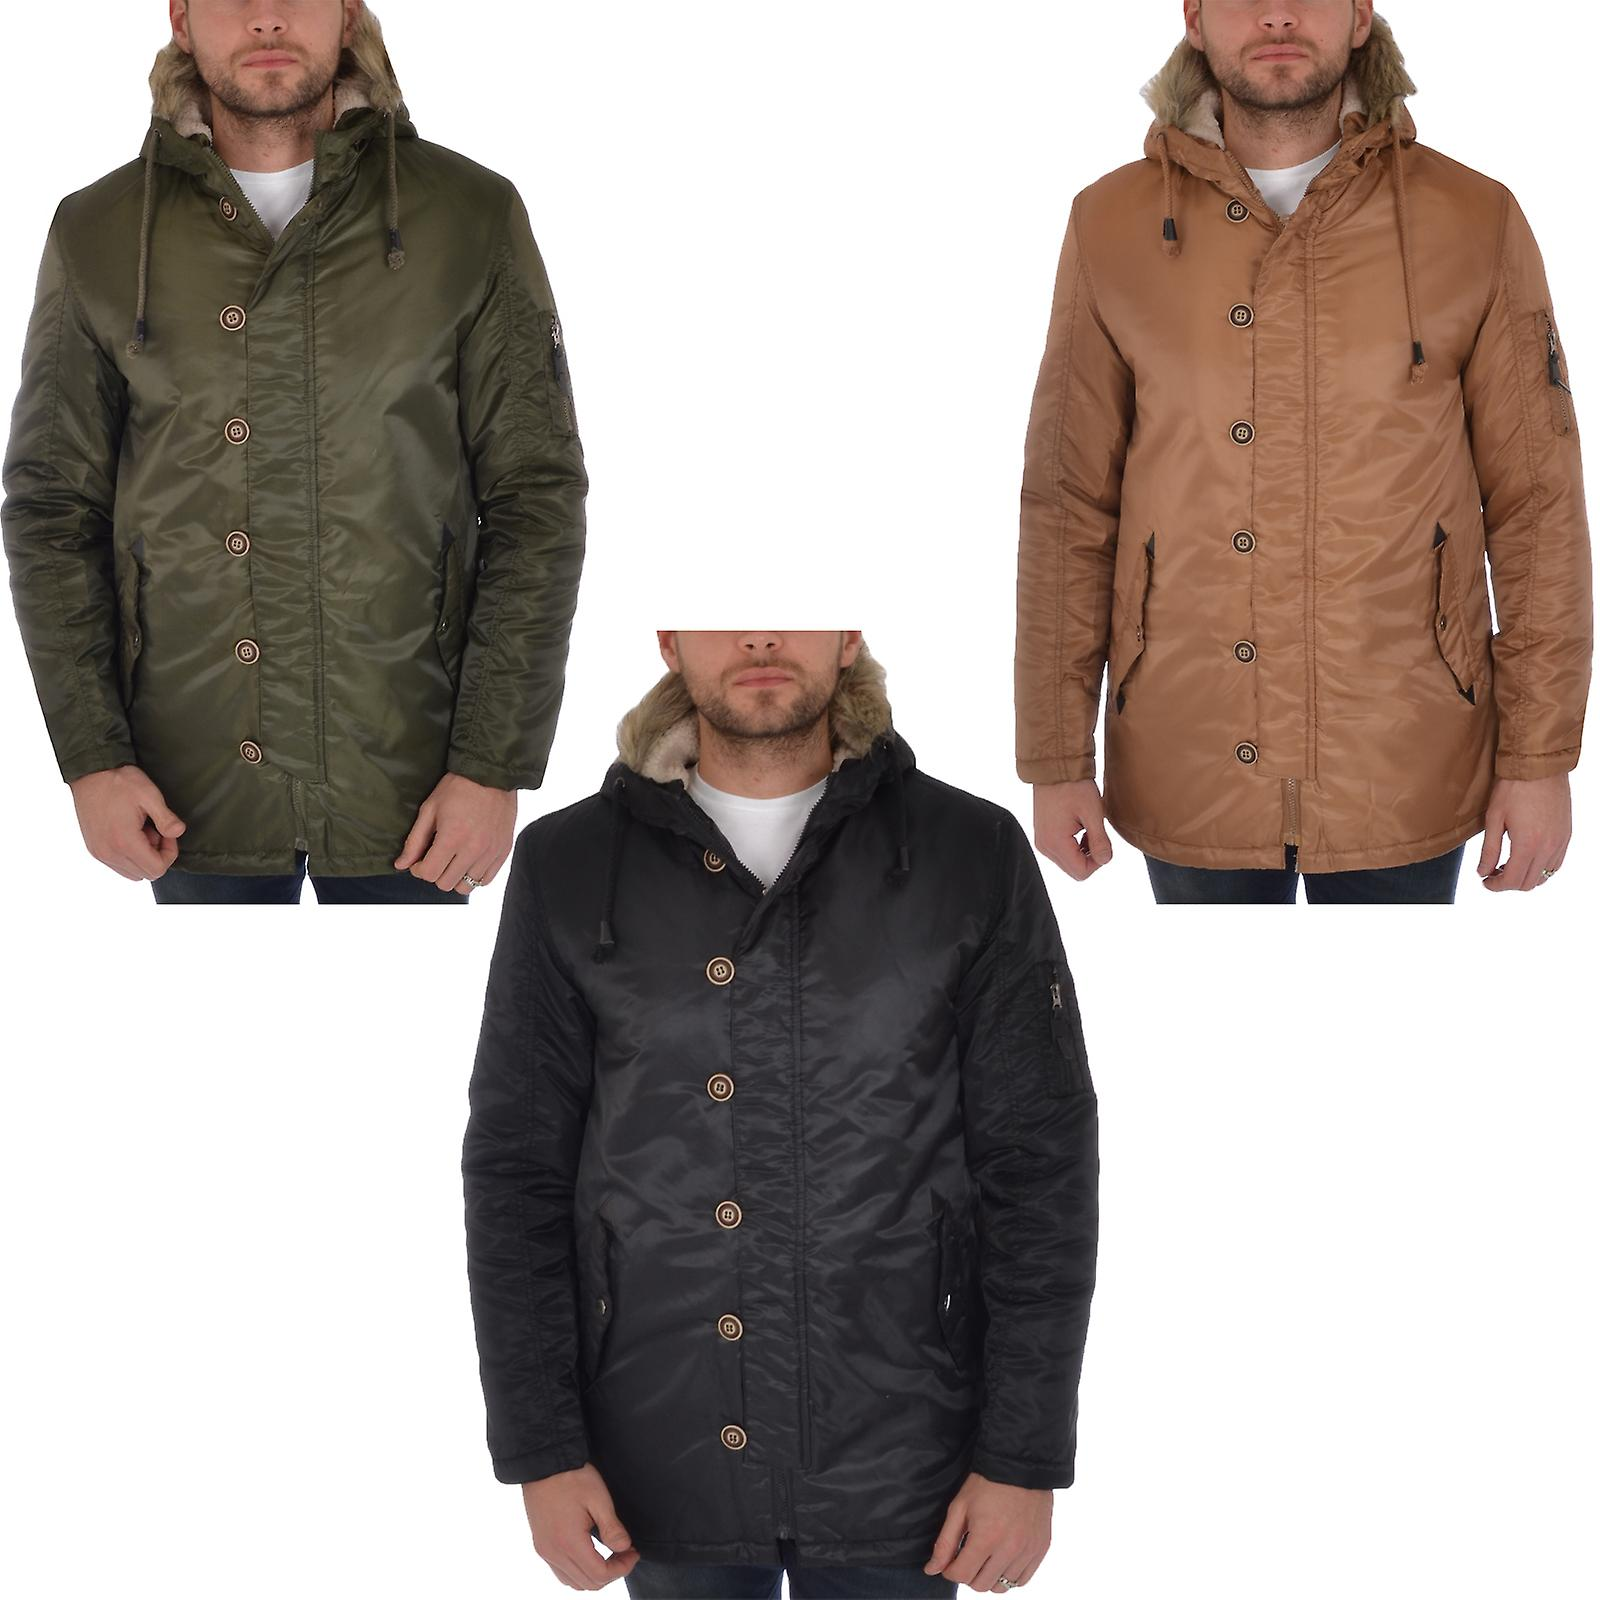 fb4cd3a7 Sjel Star Mens Faux pels hette Parka jakke polstret vinterfrakk | Fruugo